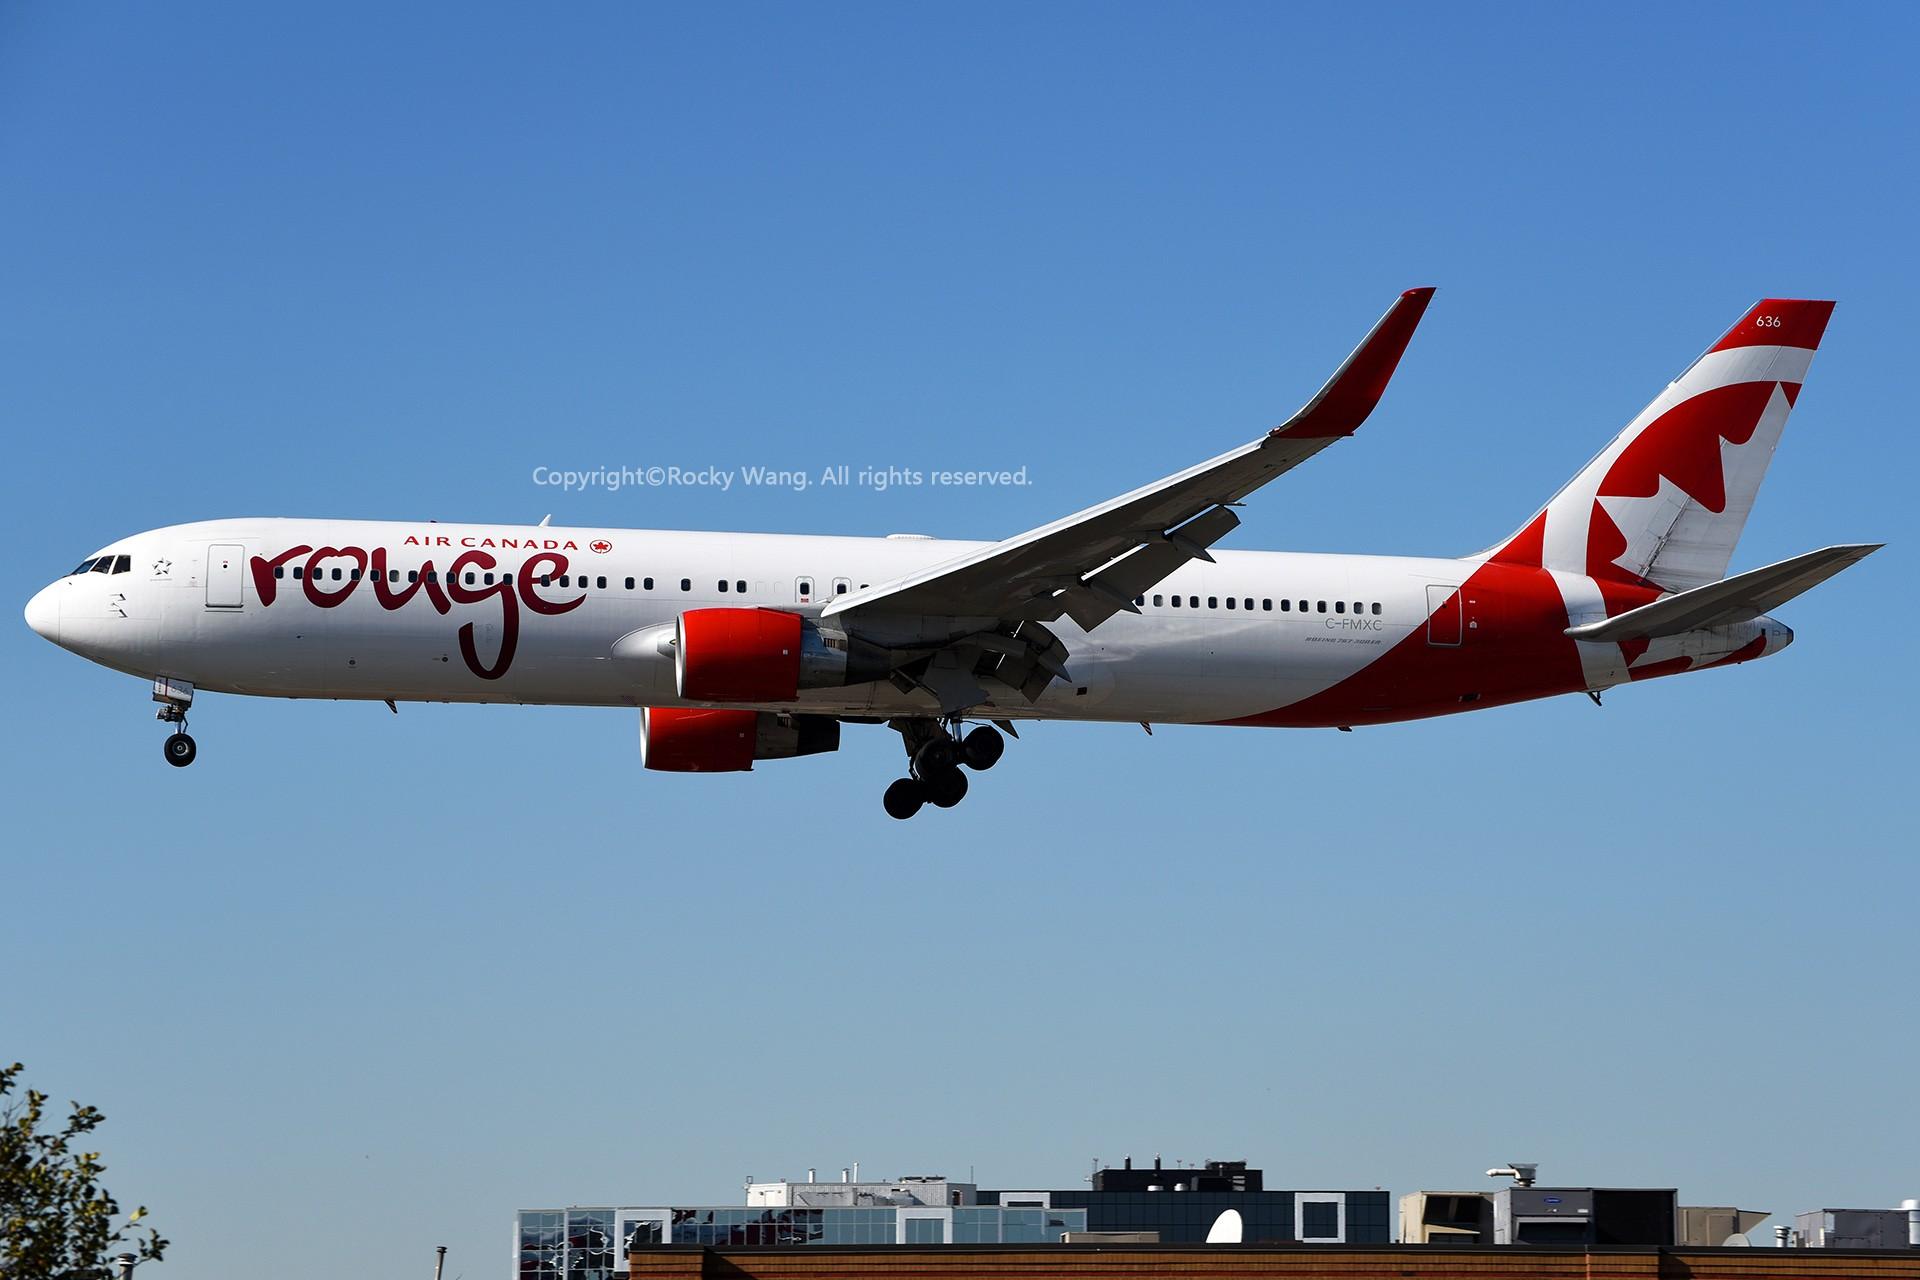 Re:[原创]CYYZ 30图 BOEING 767-333(ER) C-FMXC Toronto Lester B. Pearson Int'l Airport